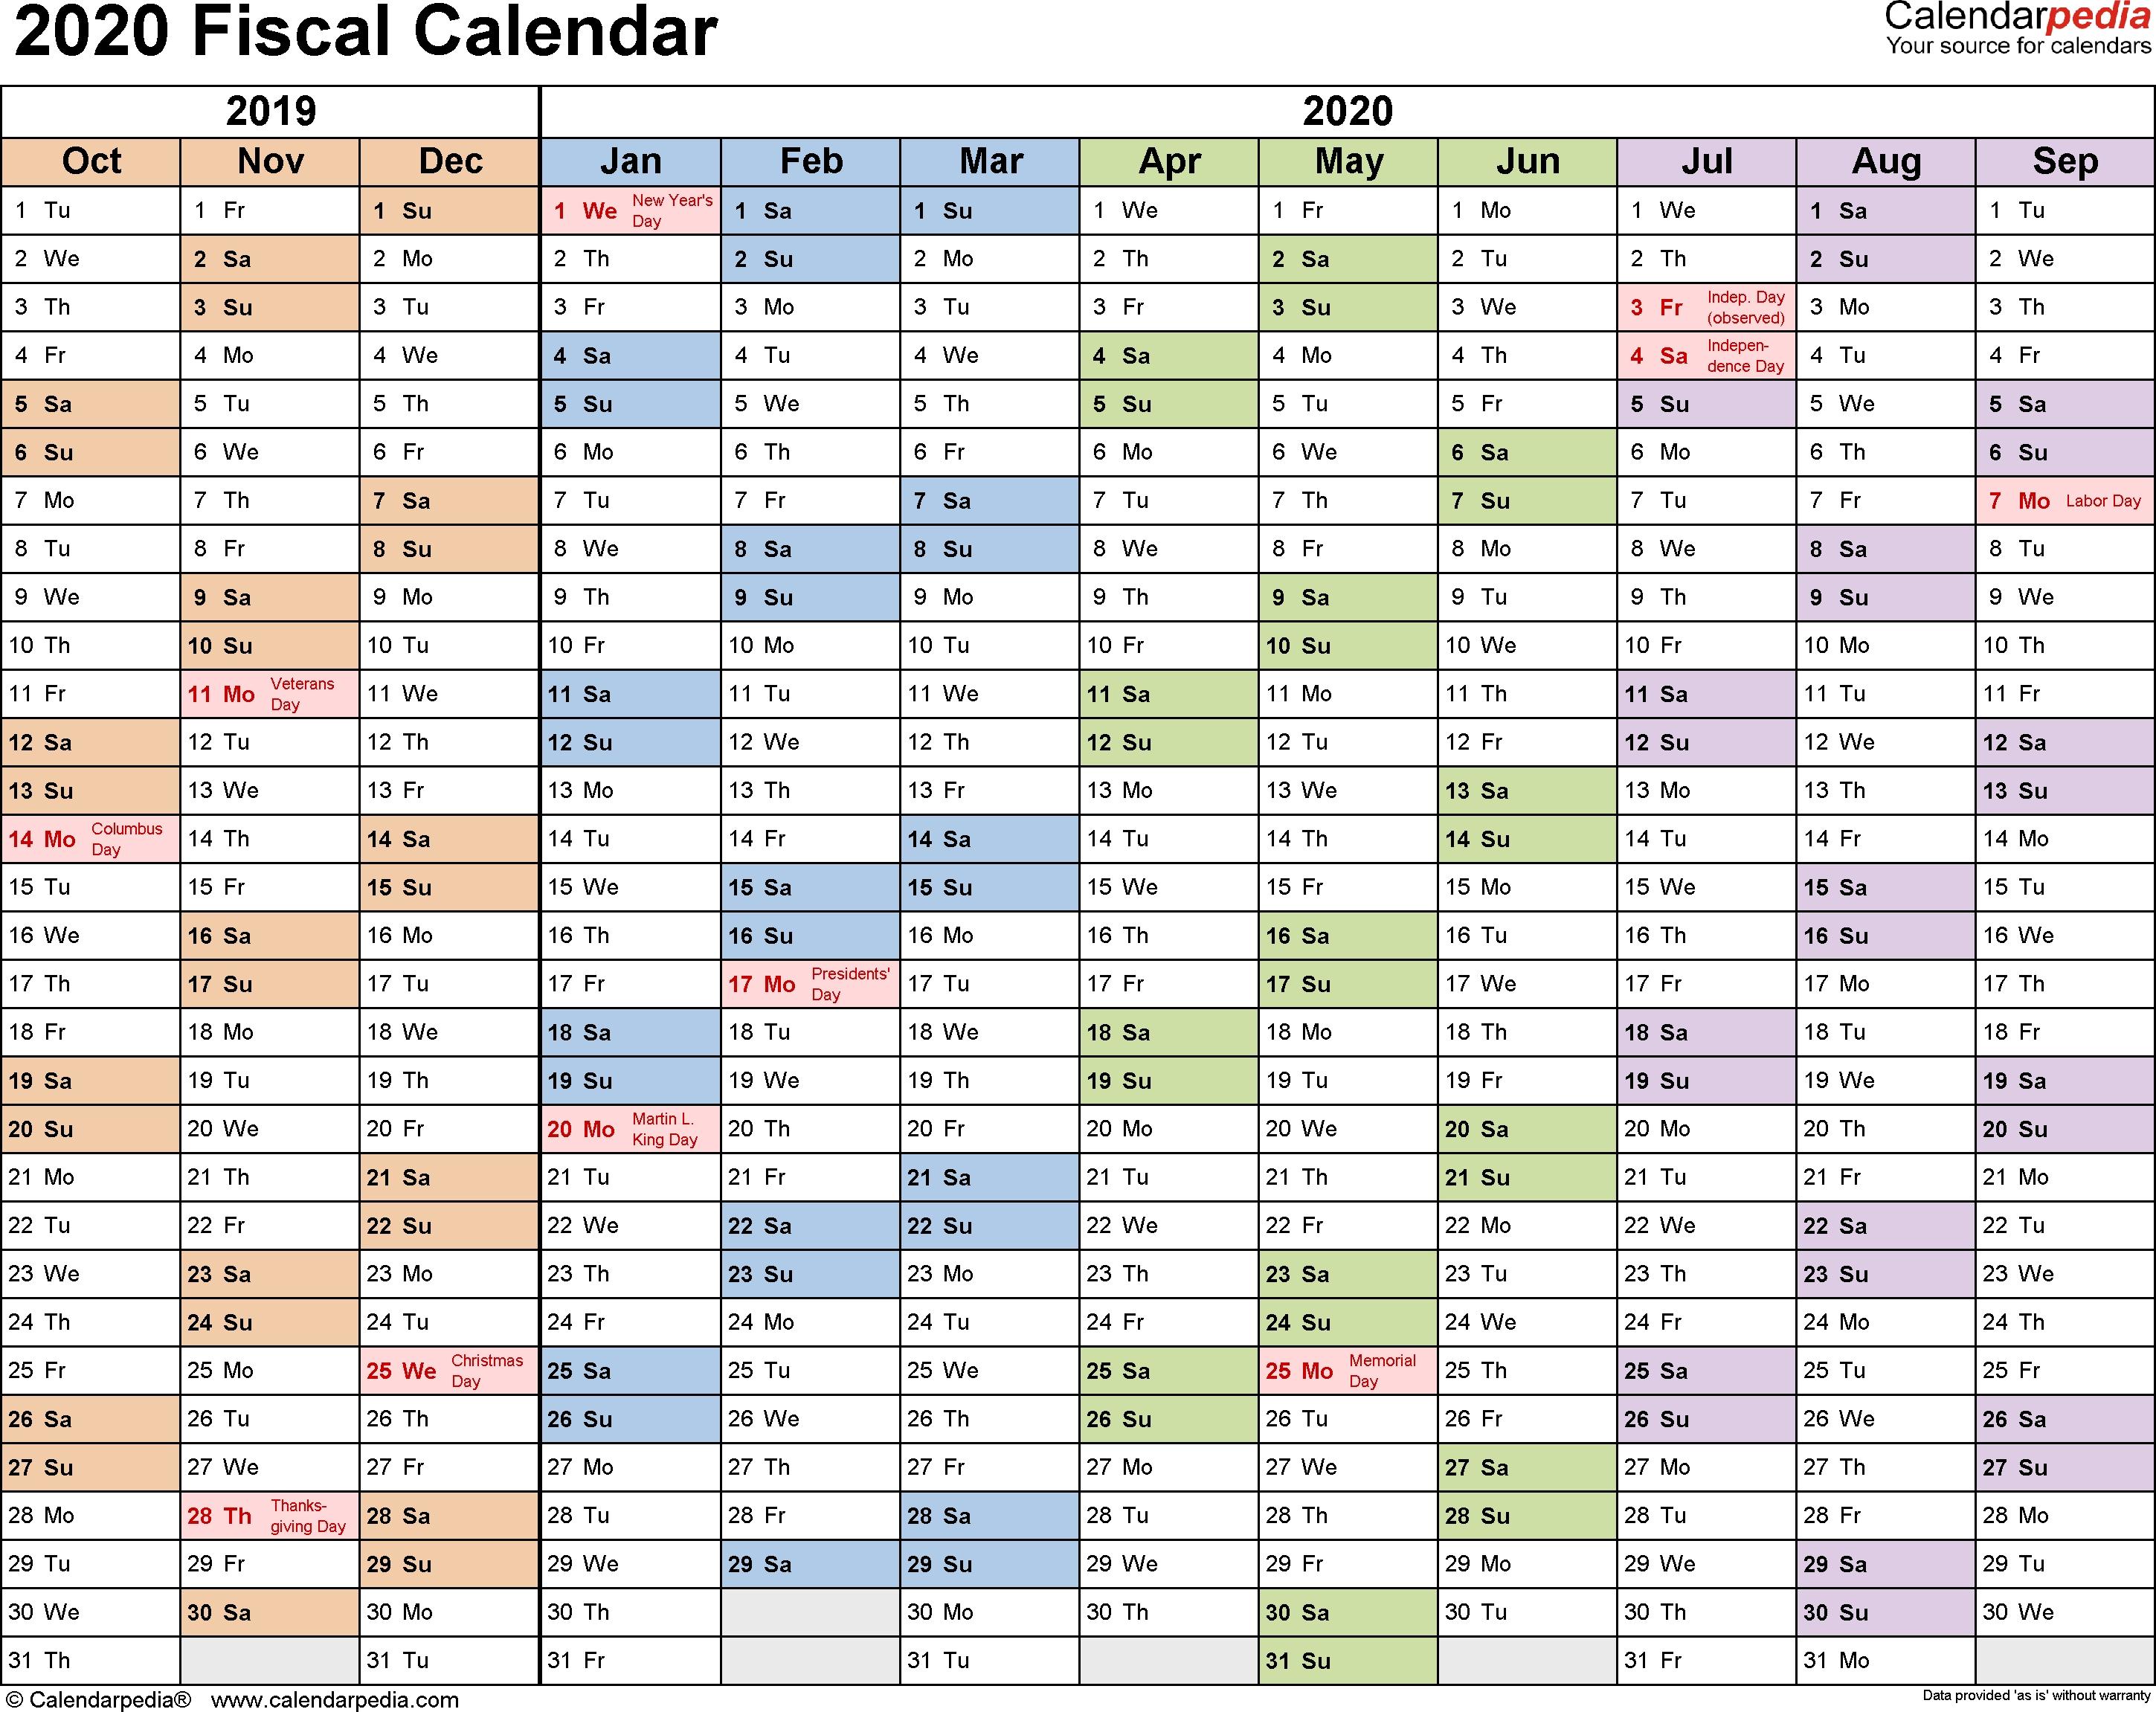 Fiscal Calendars 2020 As Free Printable Word Templates with regard to 4-4-5 Calendar 2020